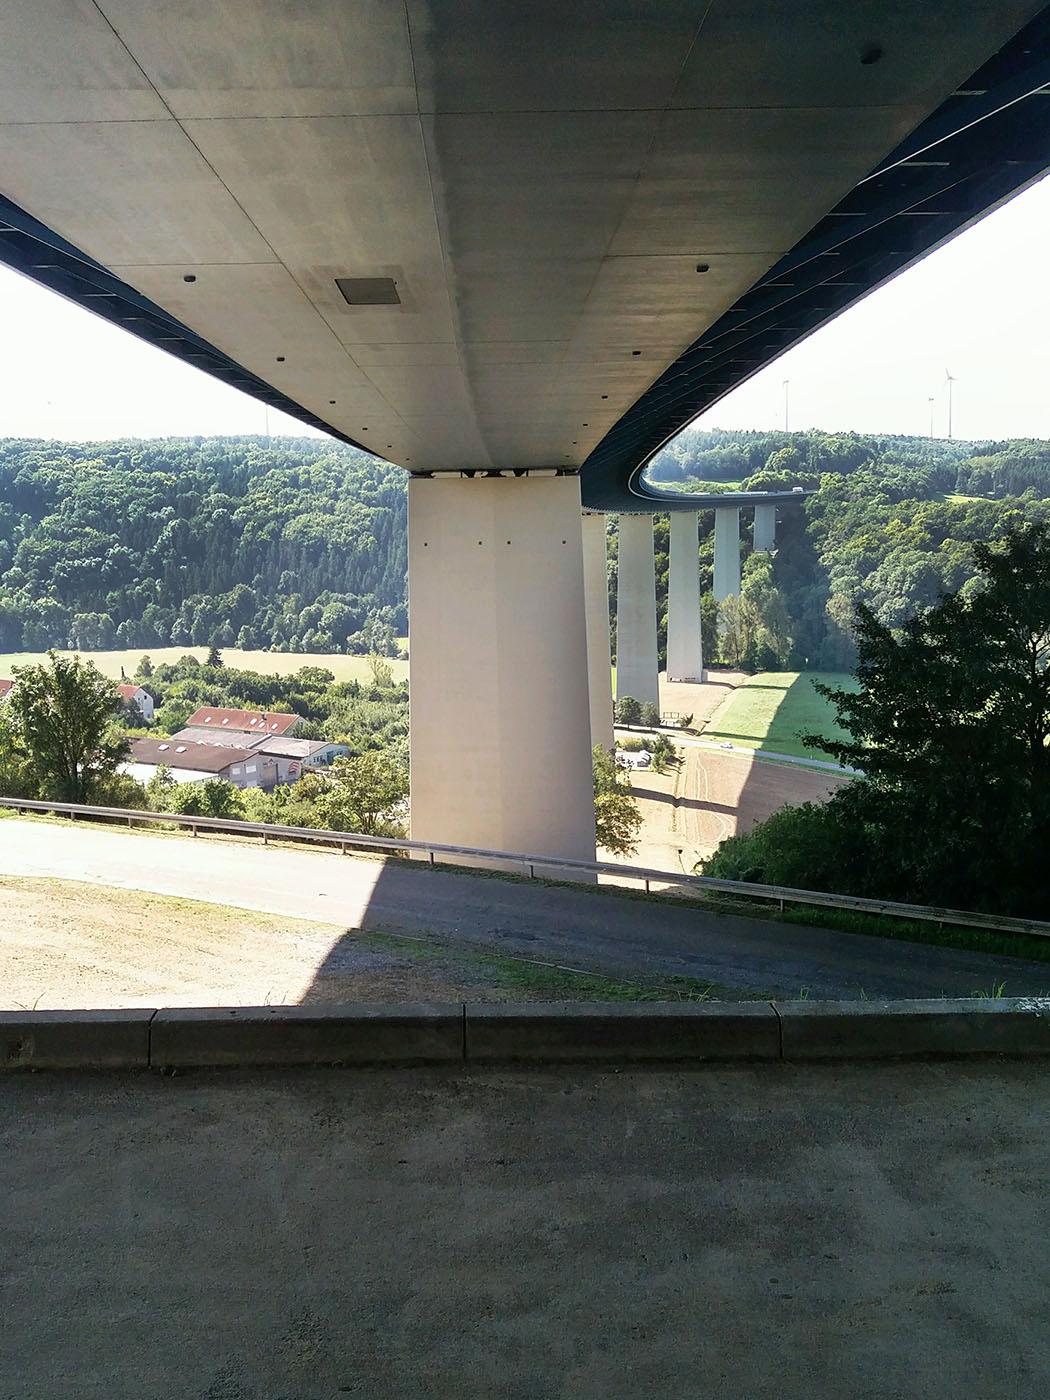 BAB A81 Jagsttalbrücke